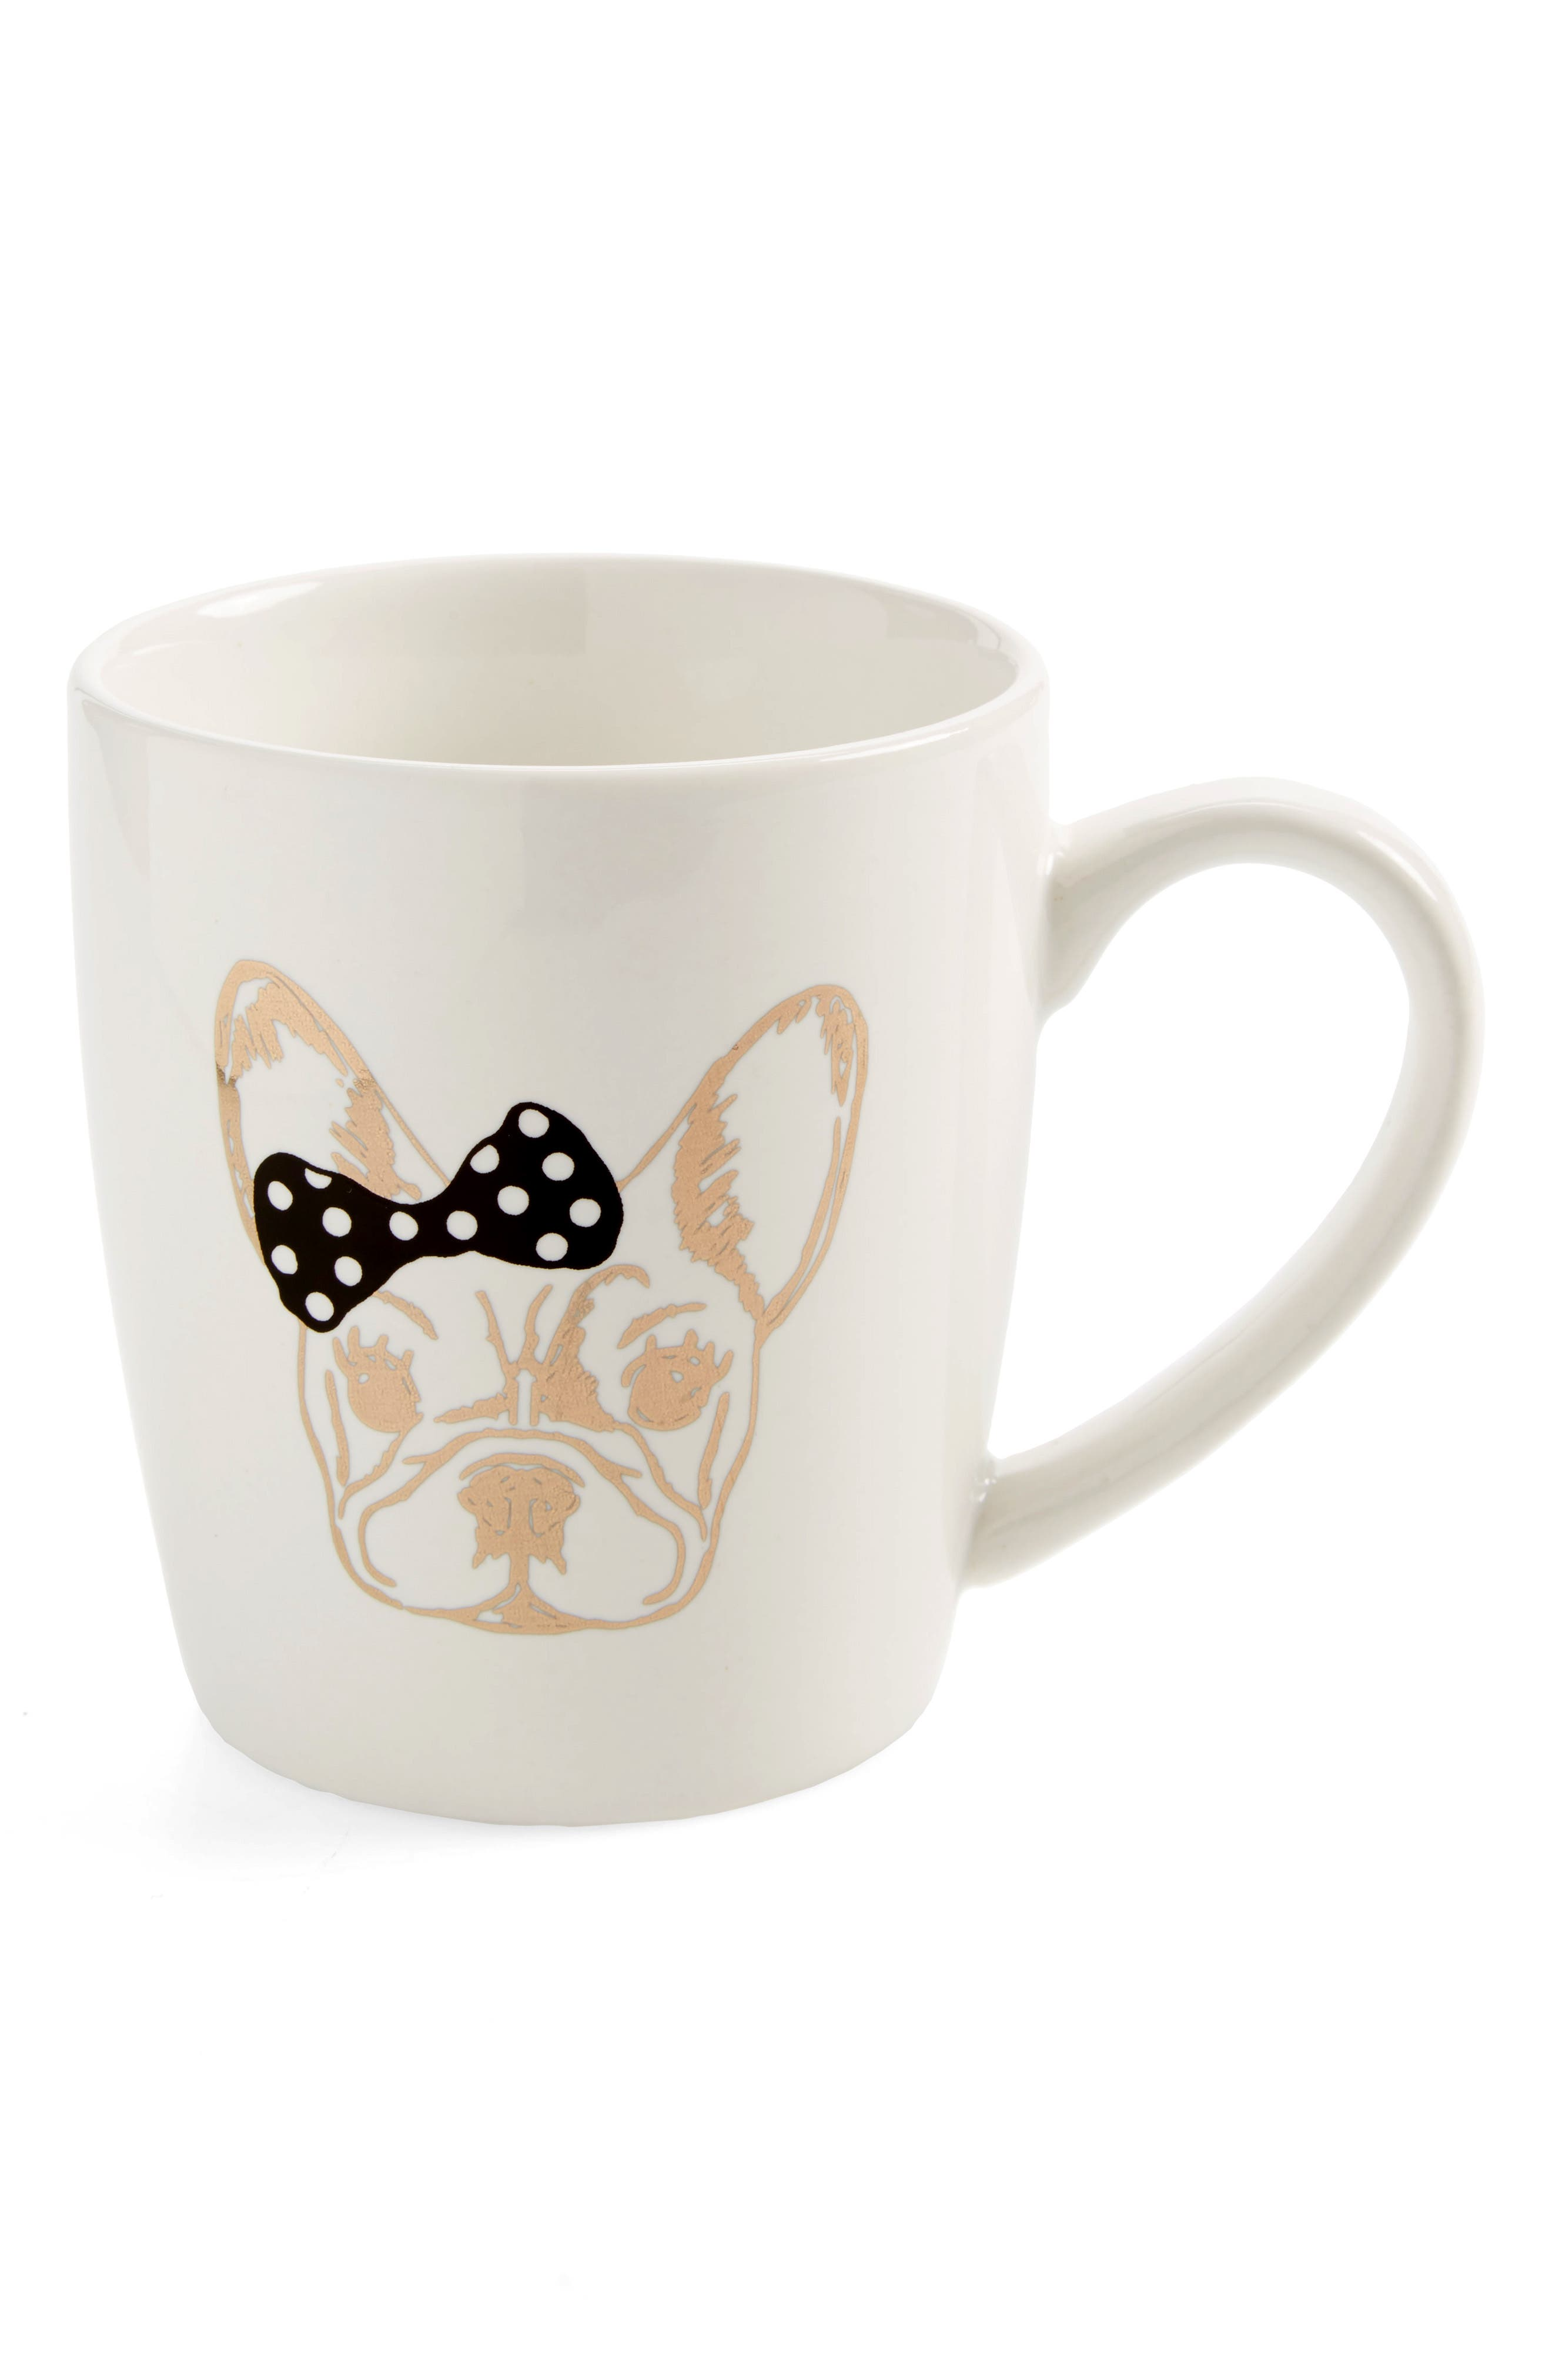 Alternate Image 1 Selected - American Atelier French Bulldog Mug